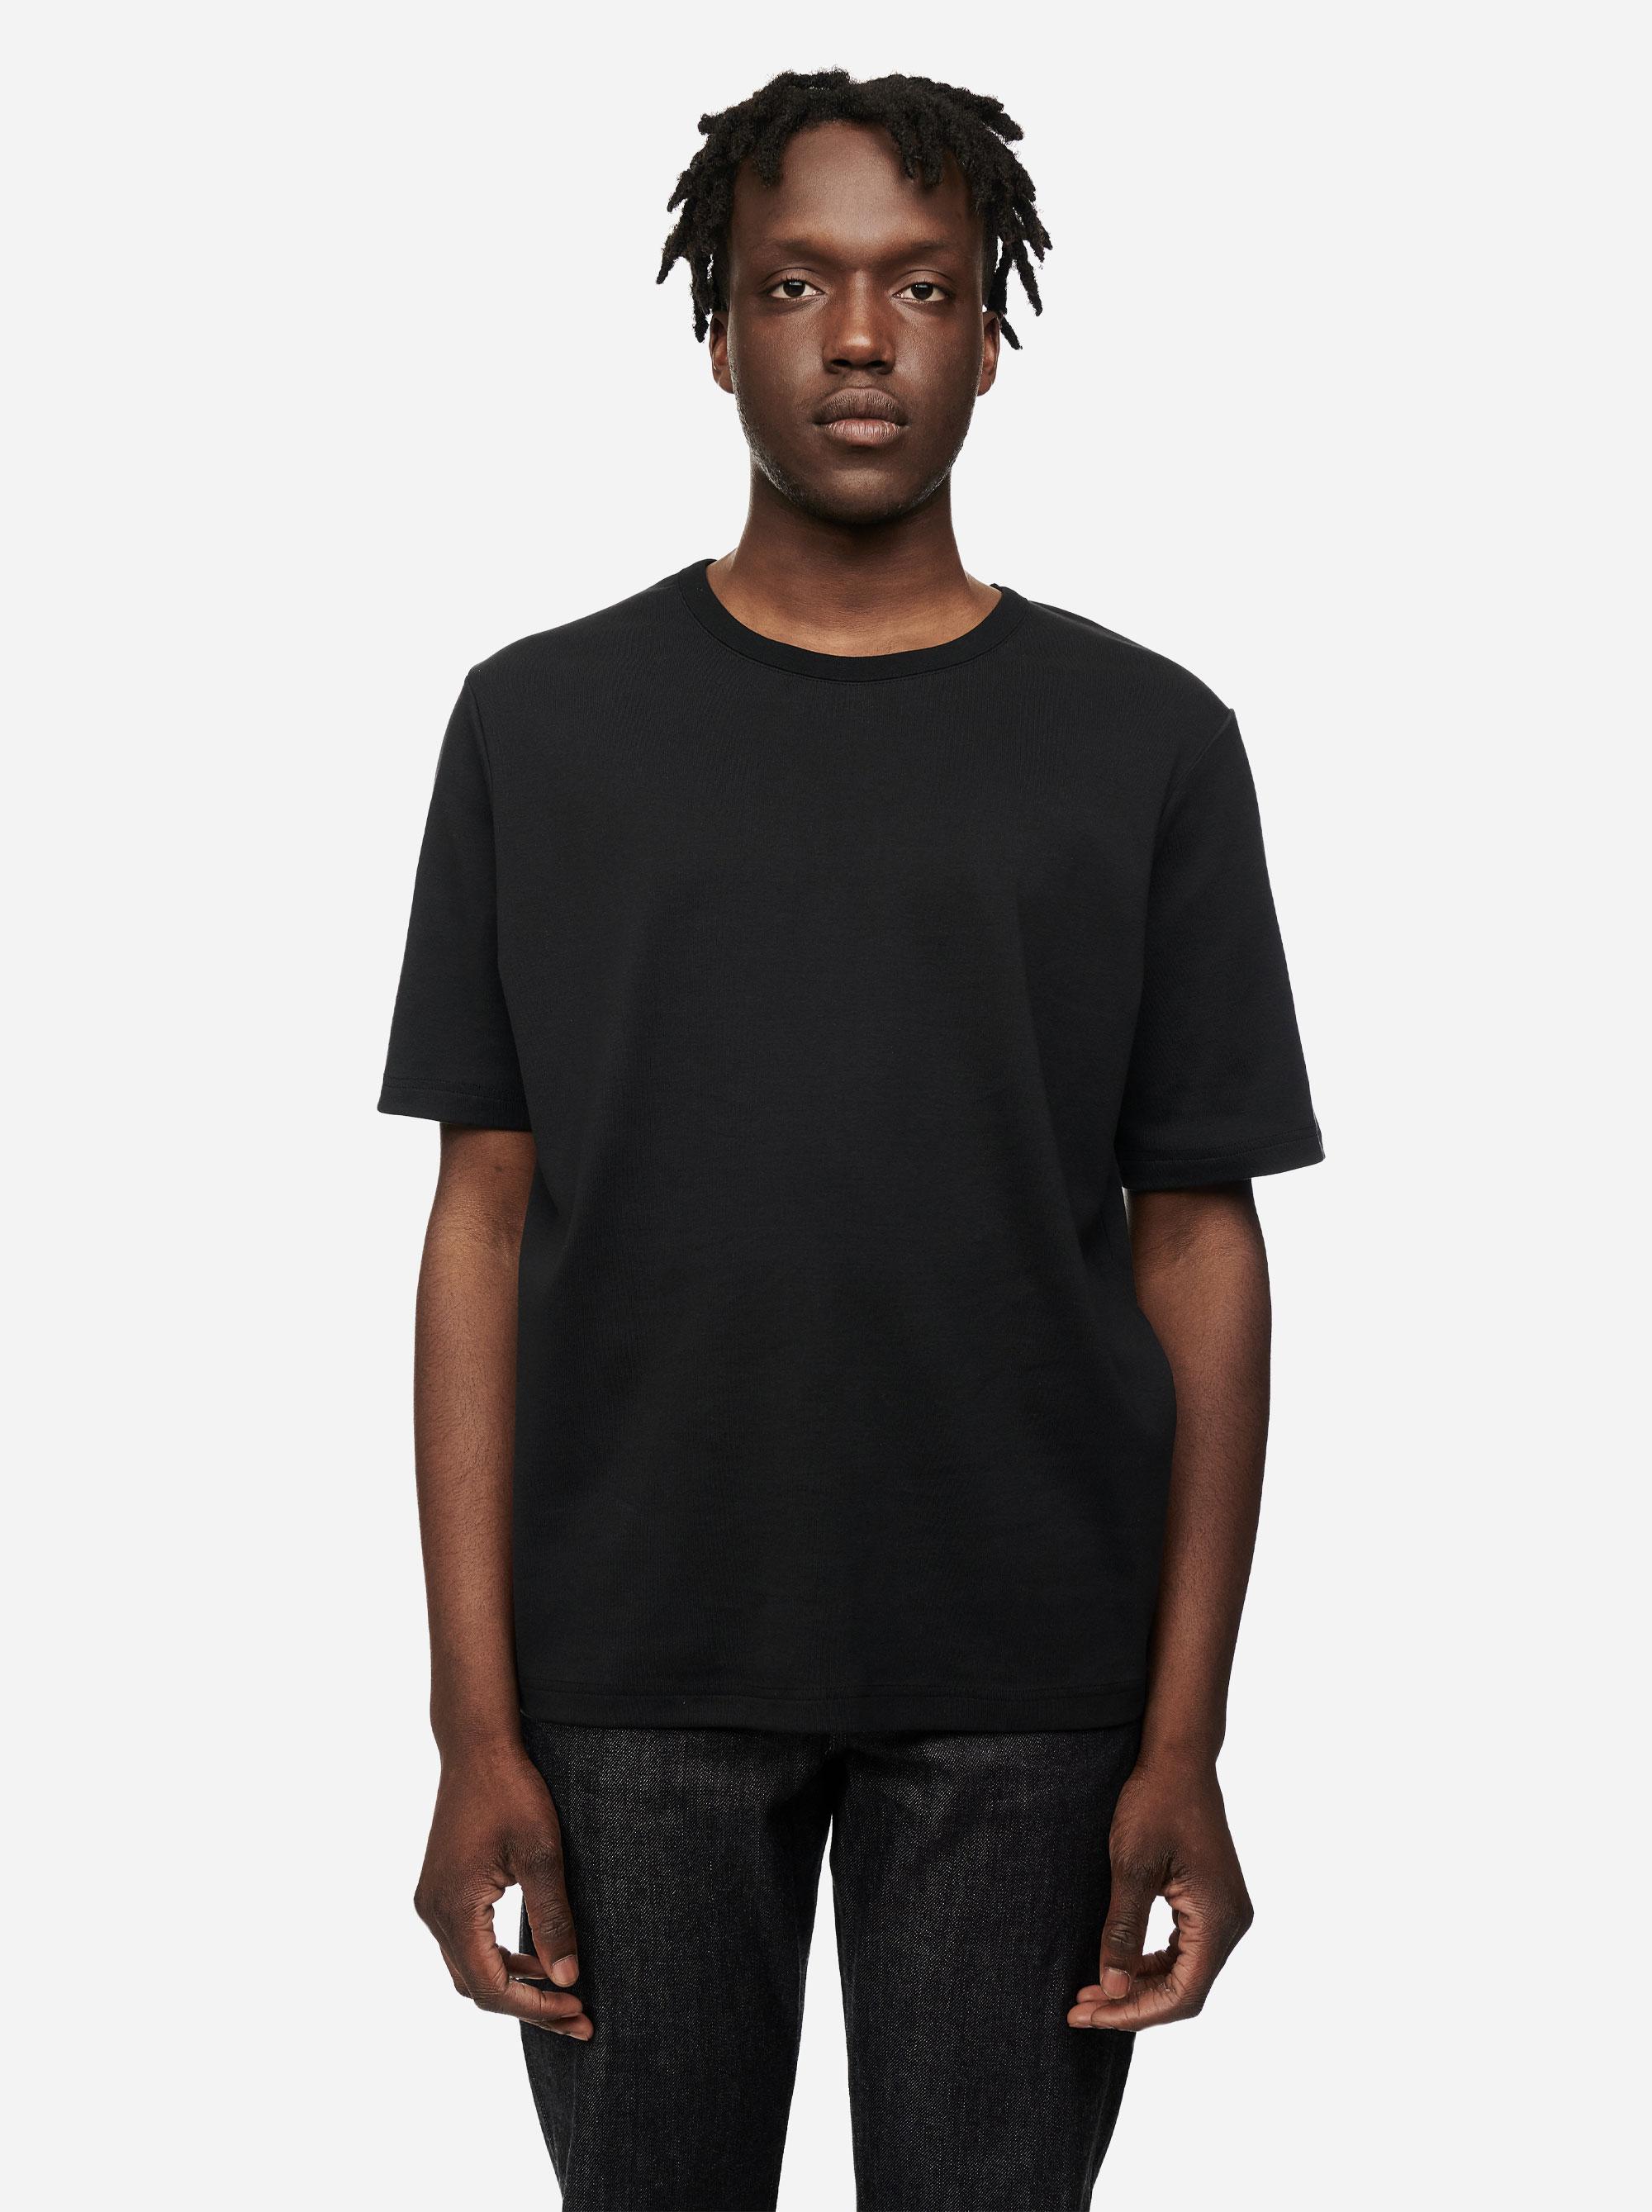 Teym - The T-Shirt - Men - Black - 2